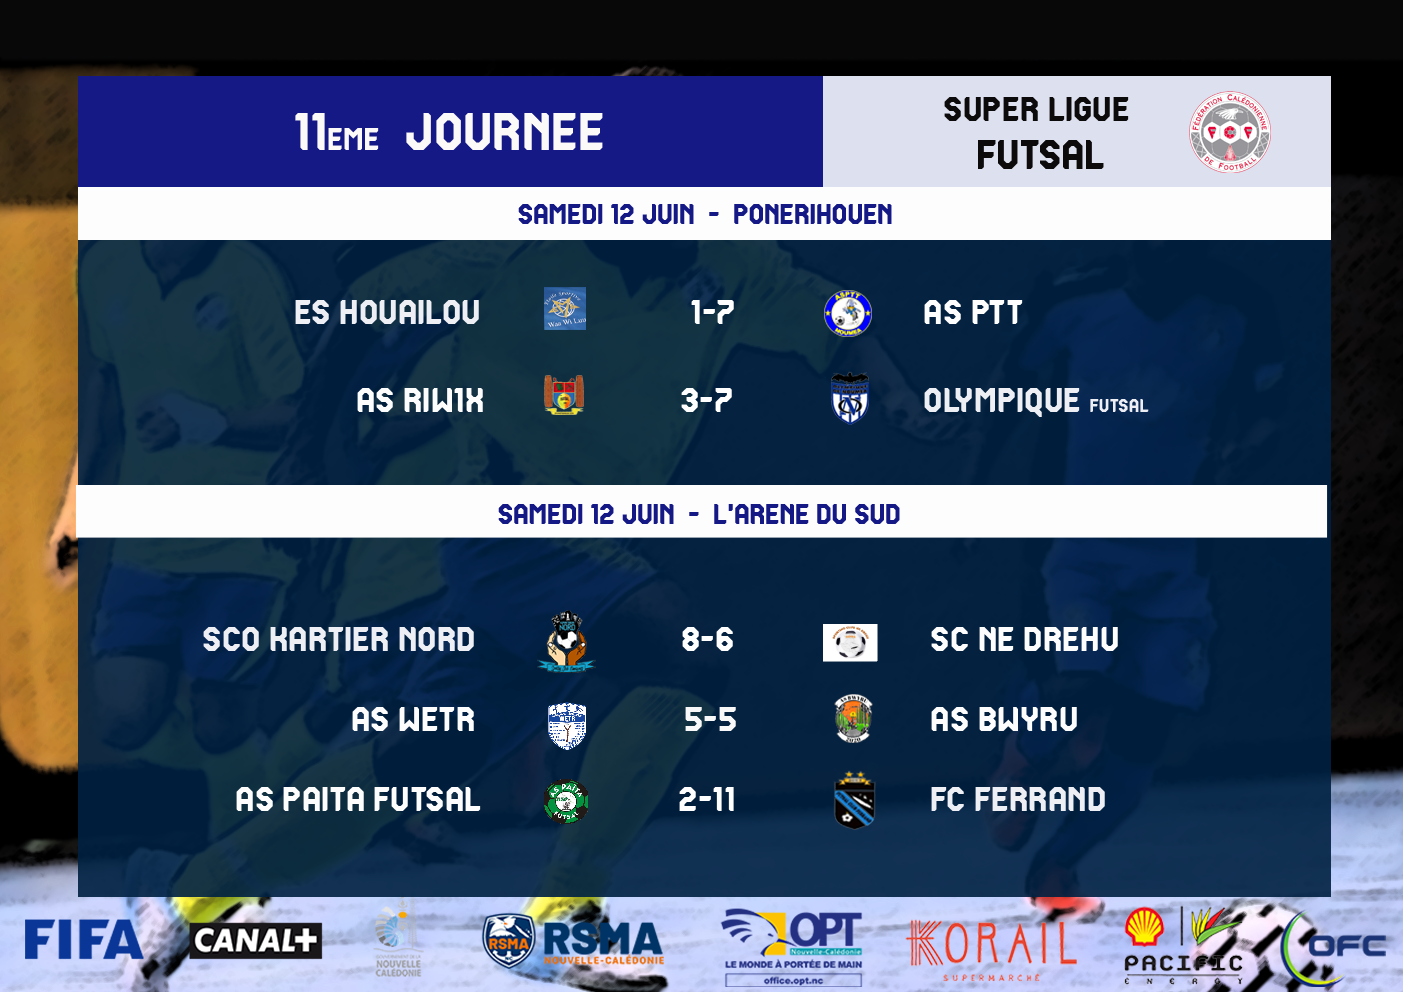 Classement - Résultats / SUPER LIGUE FUTSAL - J11